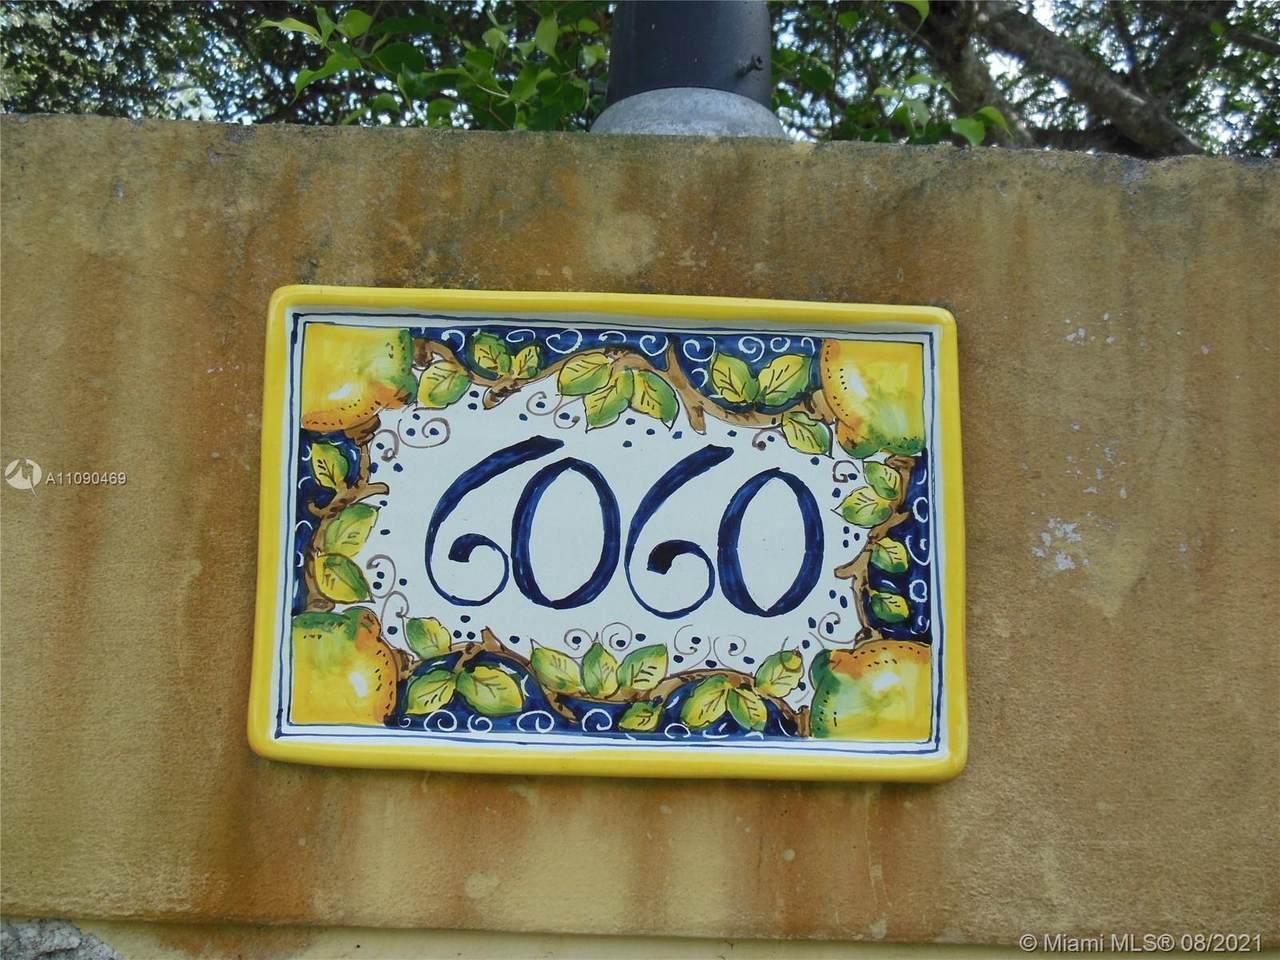 6060 118th St - Photo 1